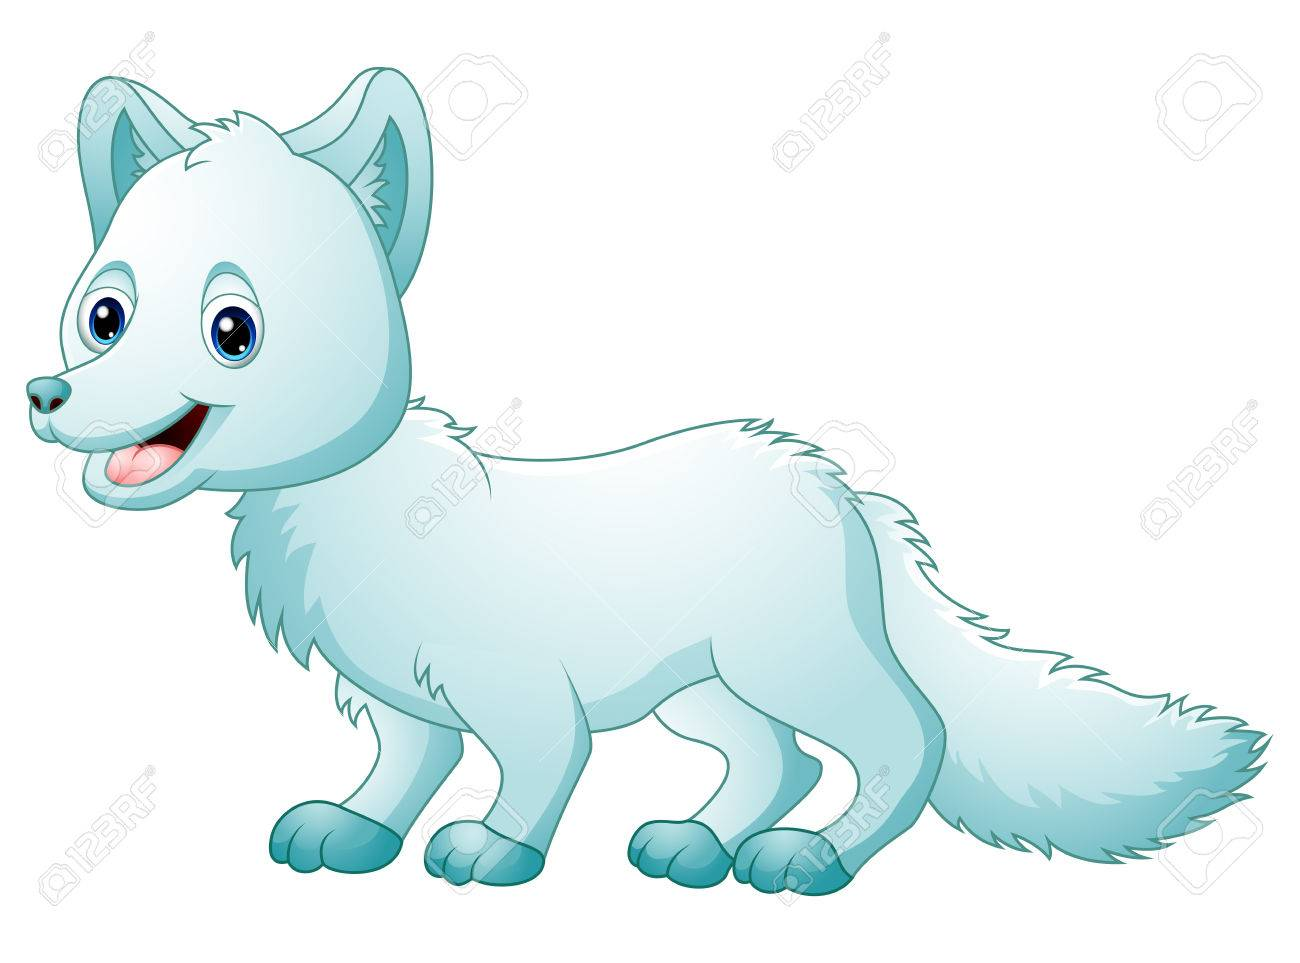 Illustration of Cute cartoon arctic fox walking - 72549451